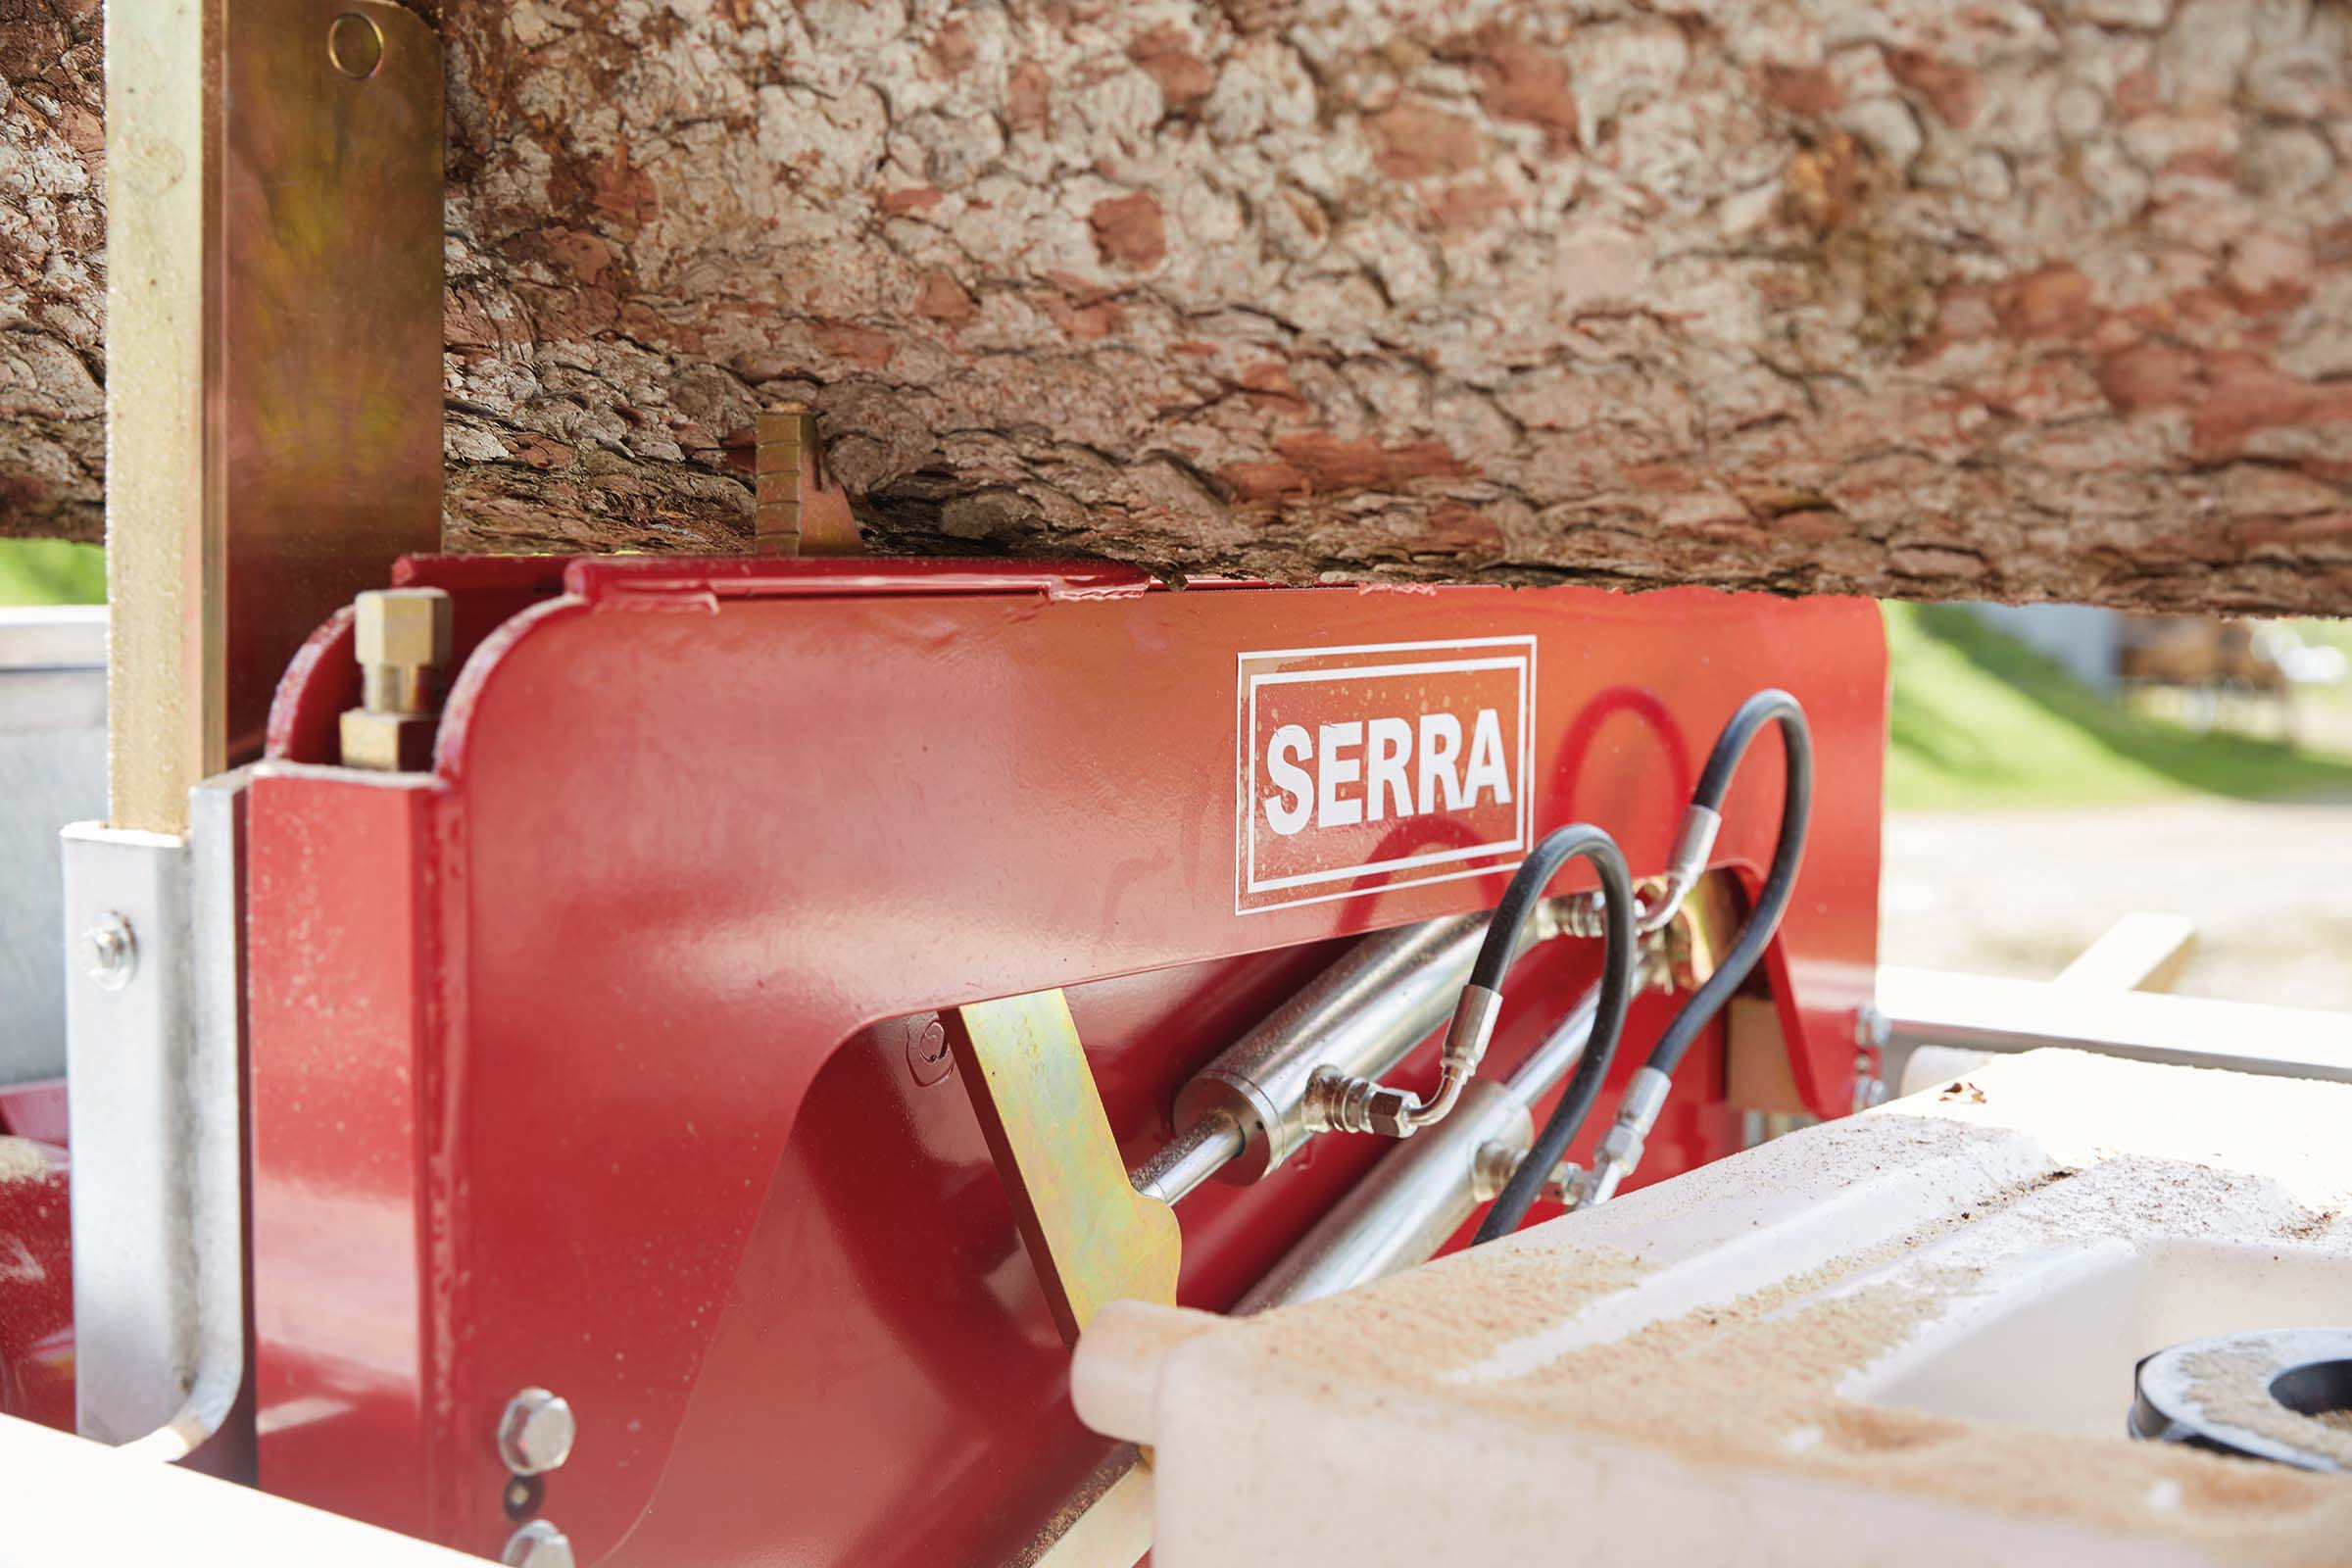 SERRA-XT-135_Rimsting_010